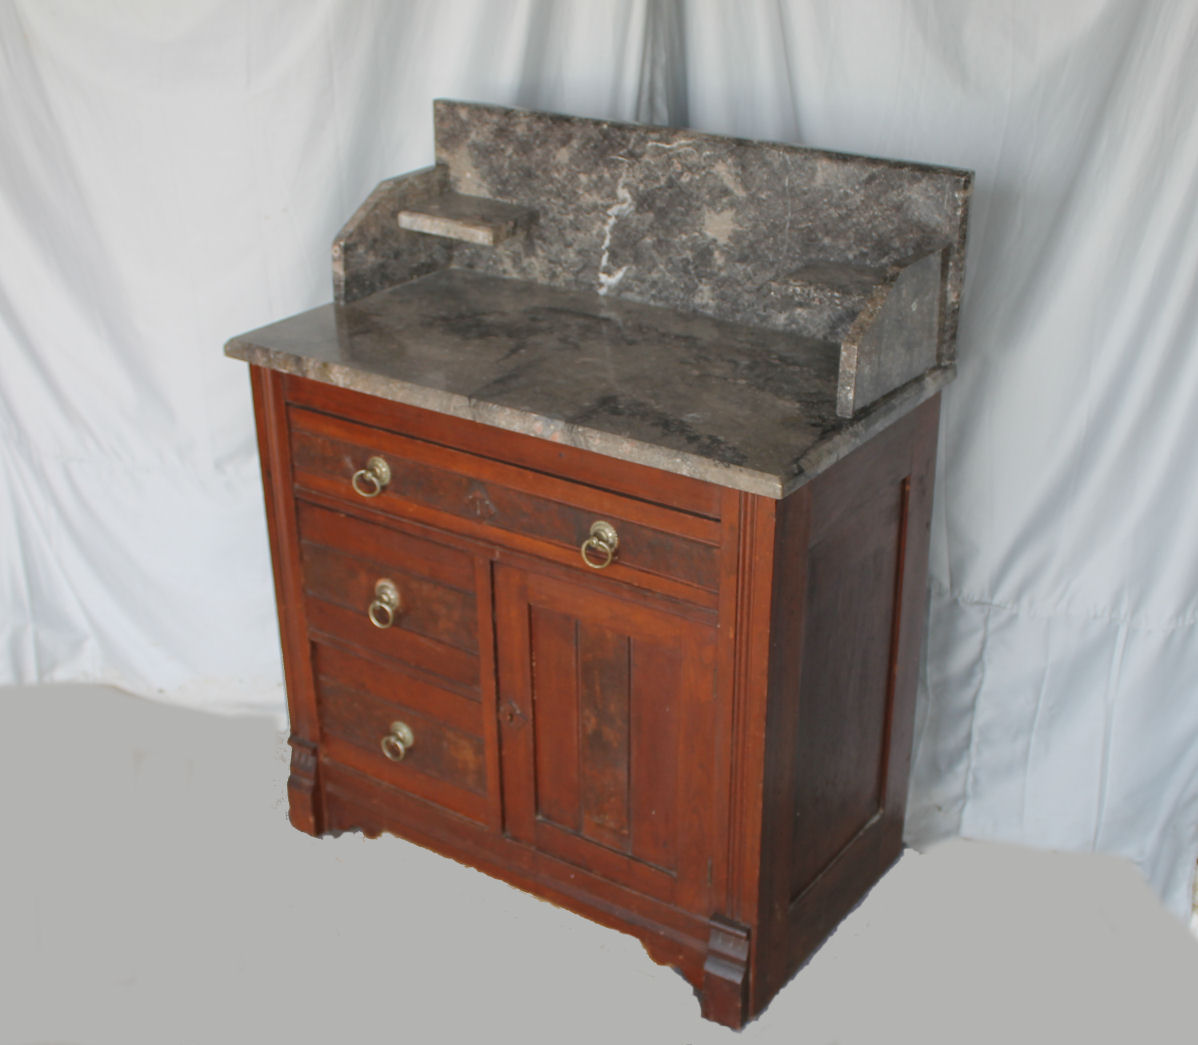 Fullsize Of Antique Wash Stand